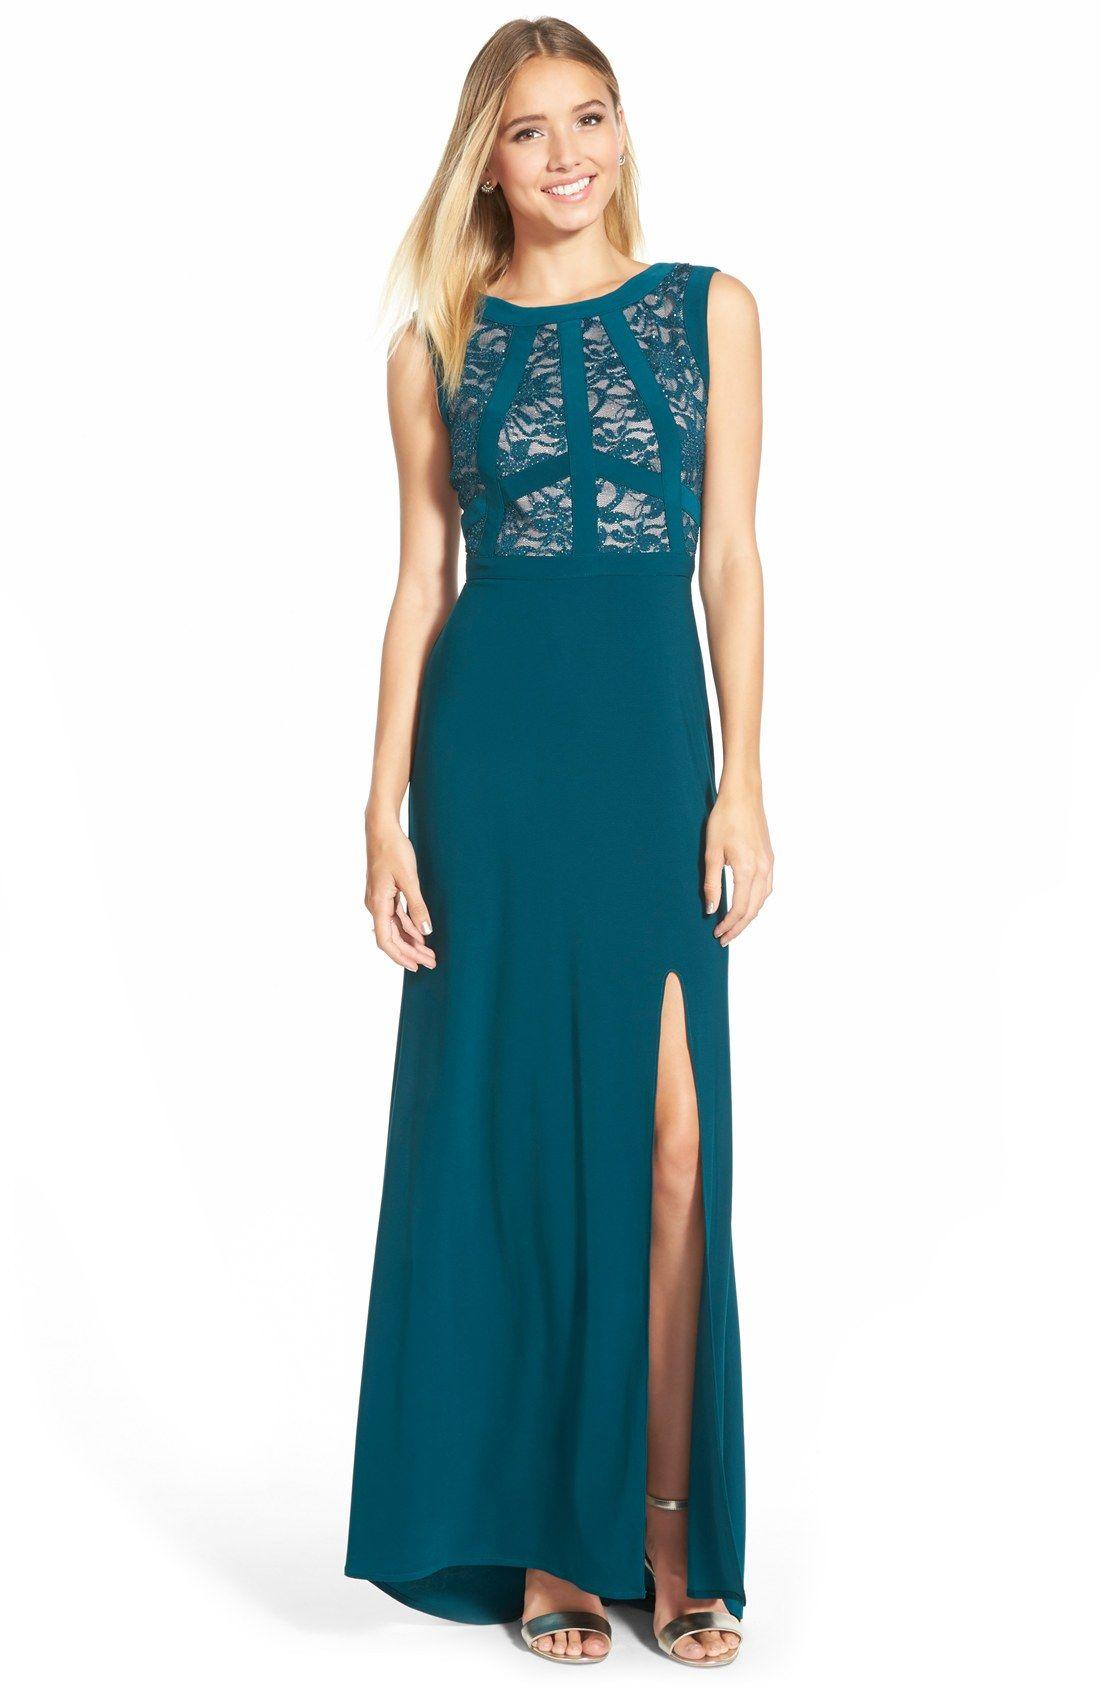 Morgan Co Lace Bodice Gown Nordstrom Gowns Guest Dresses Dresses [ 1687 x 1100 Pixel ]